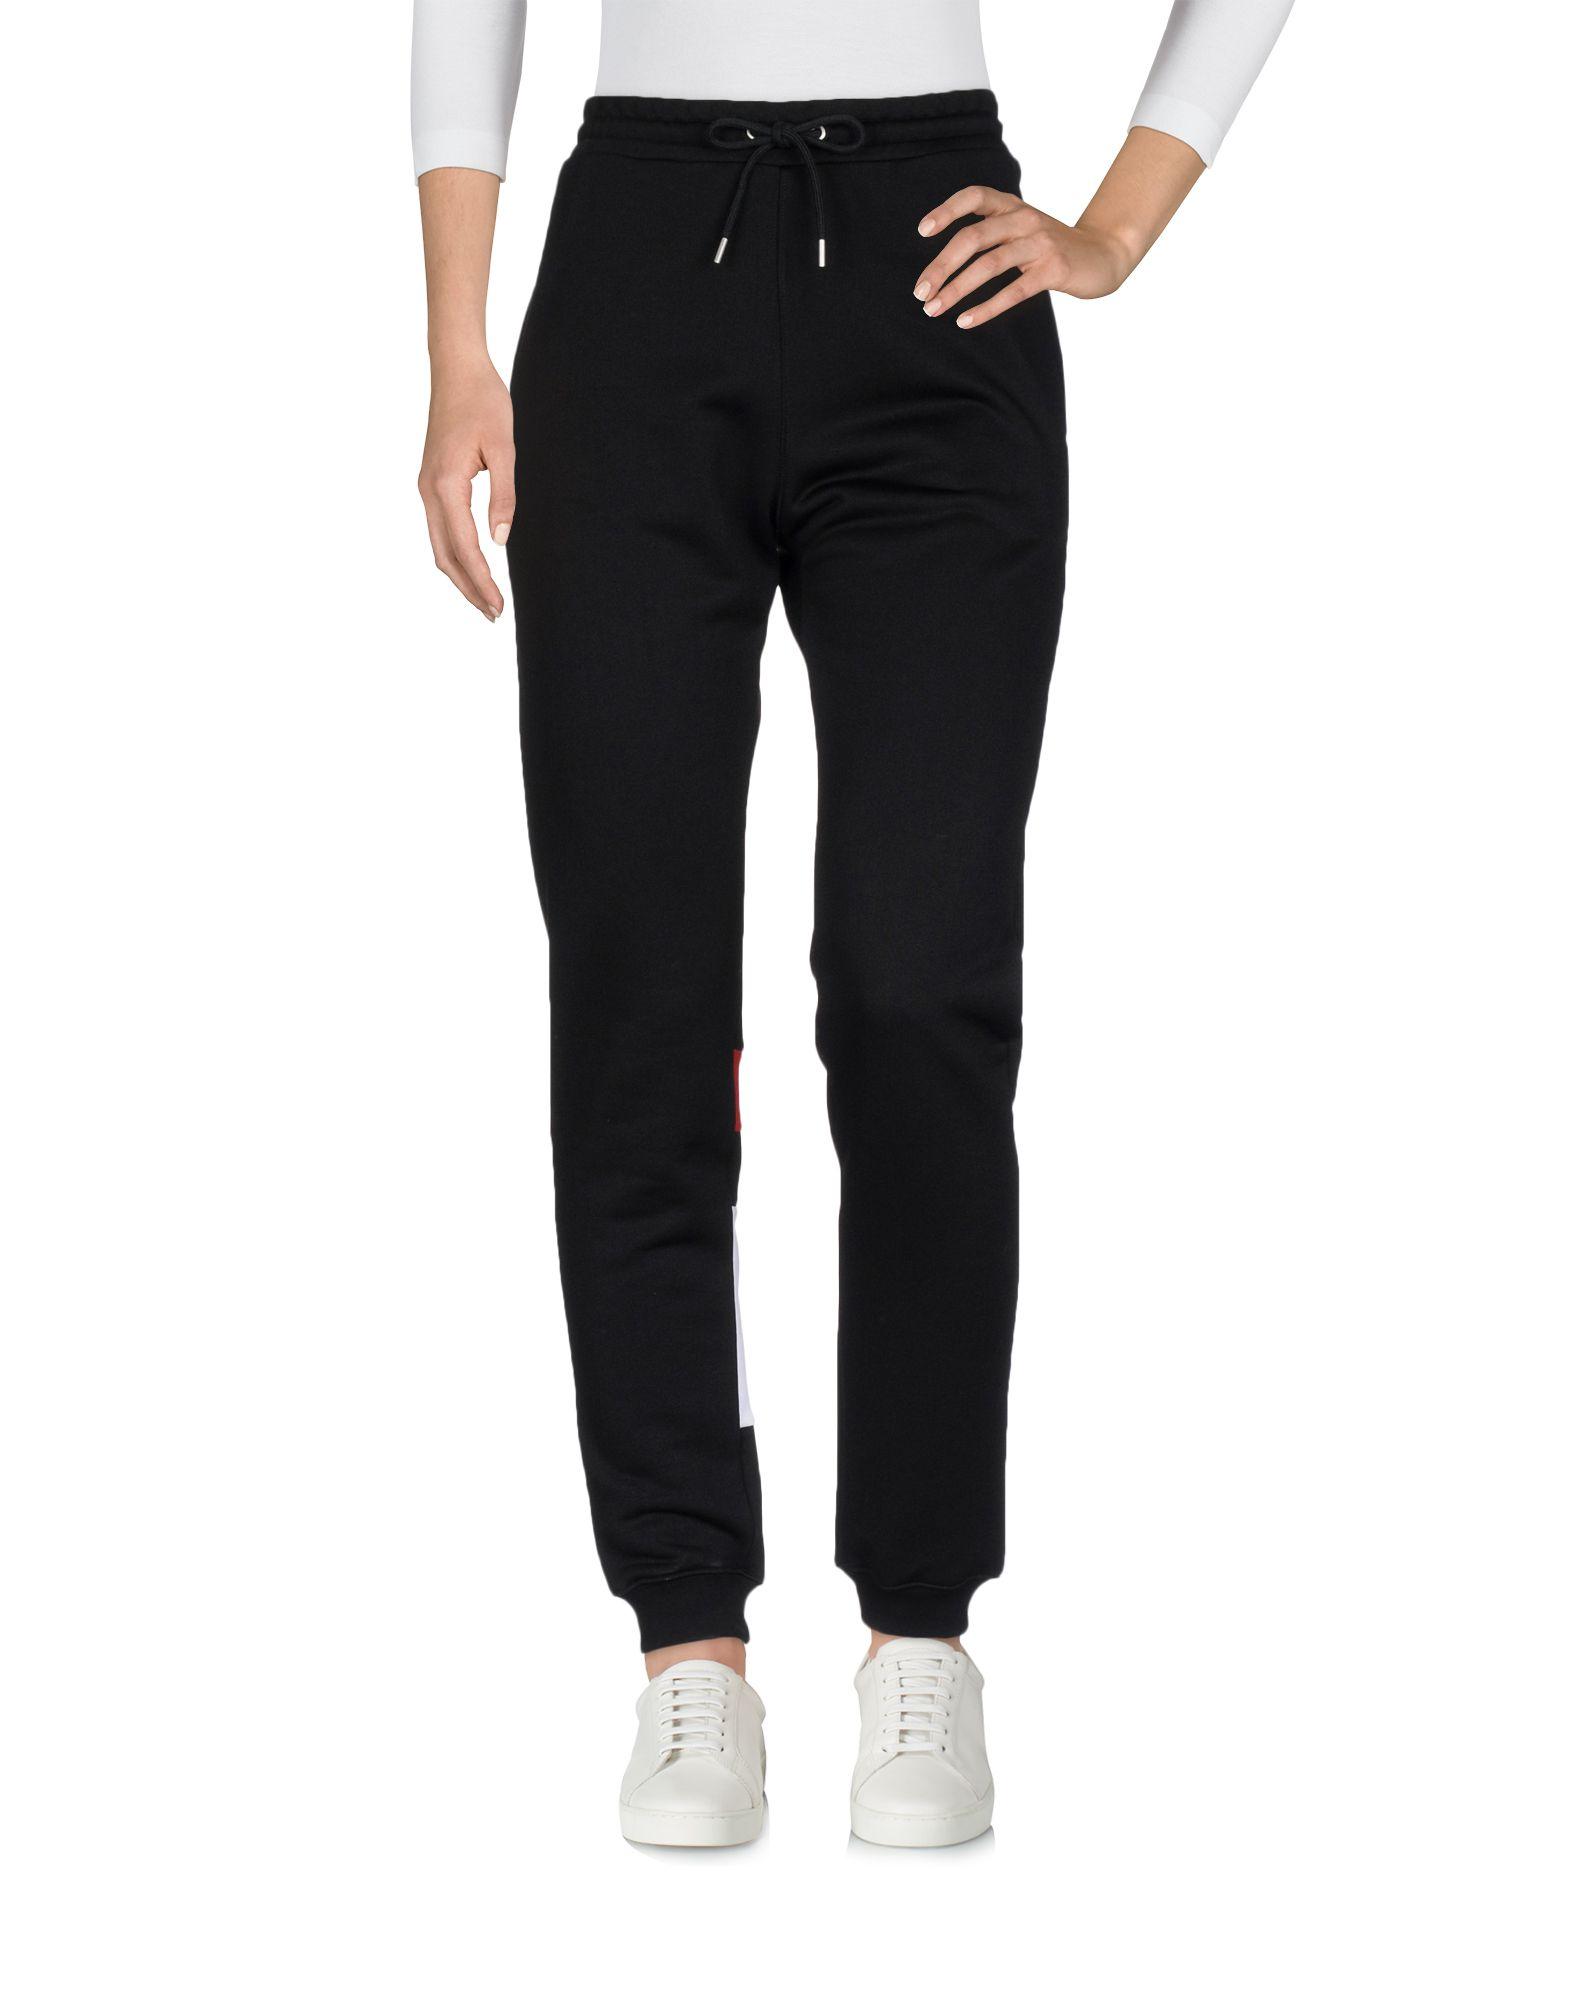 Pantalone Msgm Donna - Acquista online su 53Yna